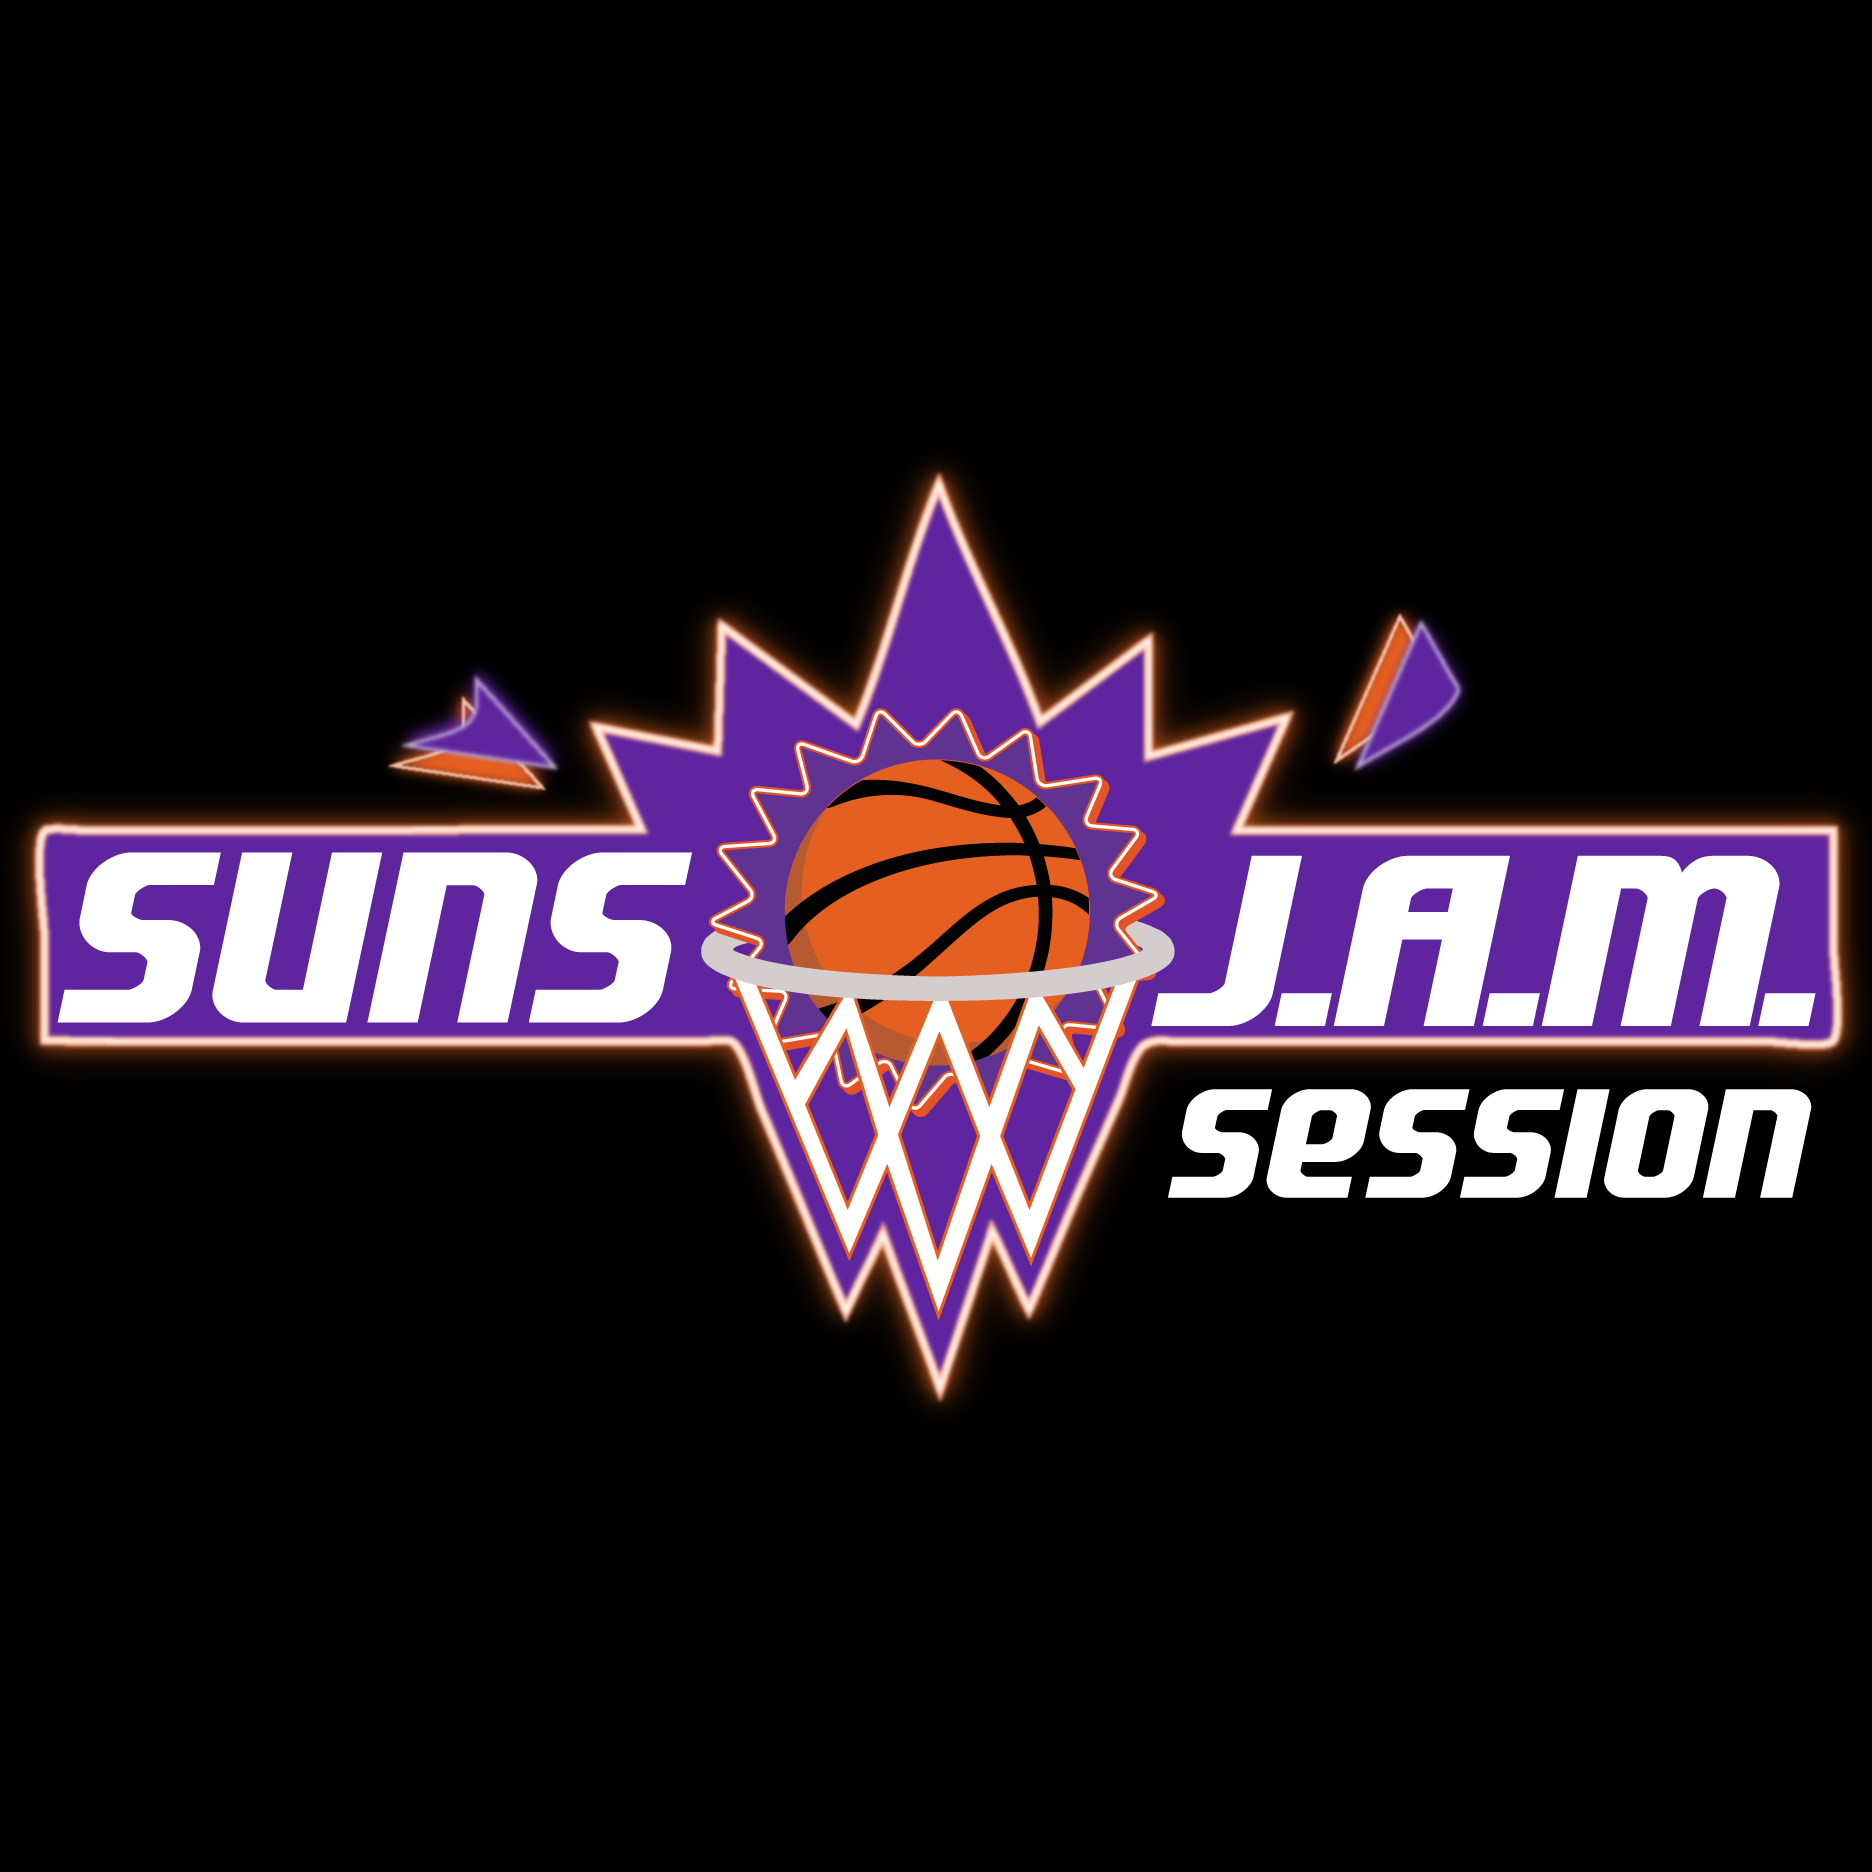 Suns JAM Session: The Last Dance Discussion (Ep. 5 & 6)